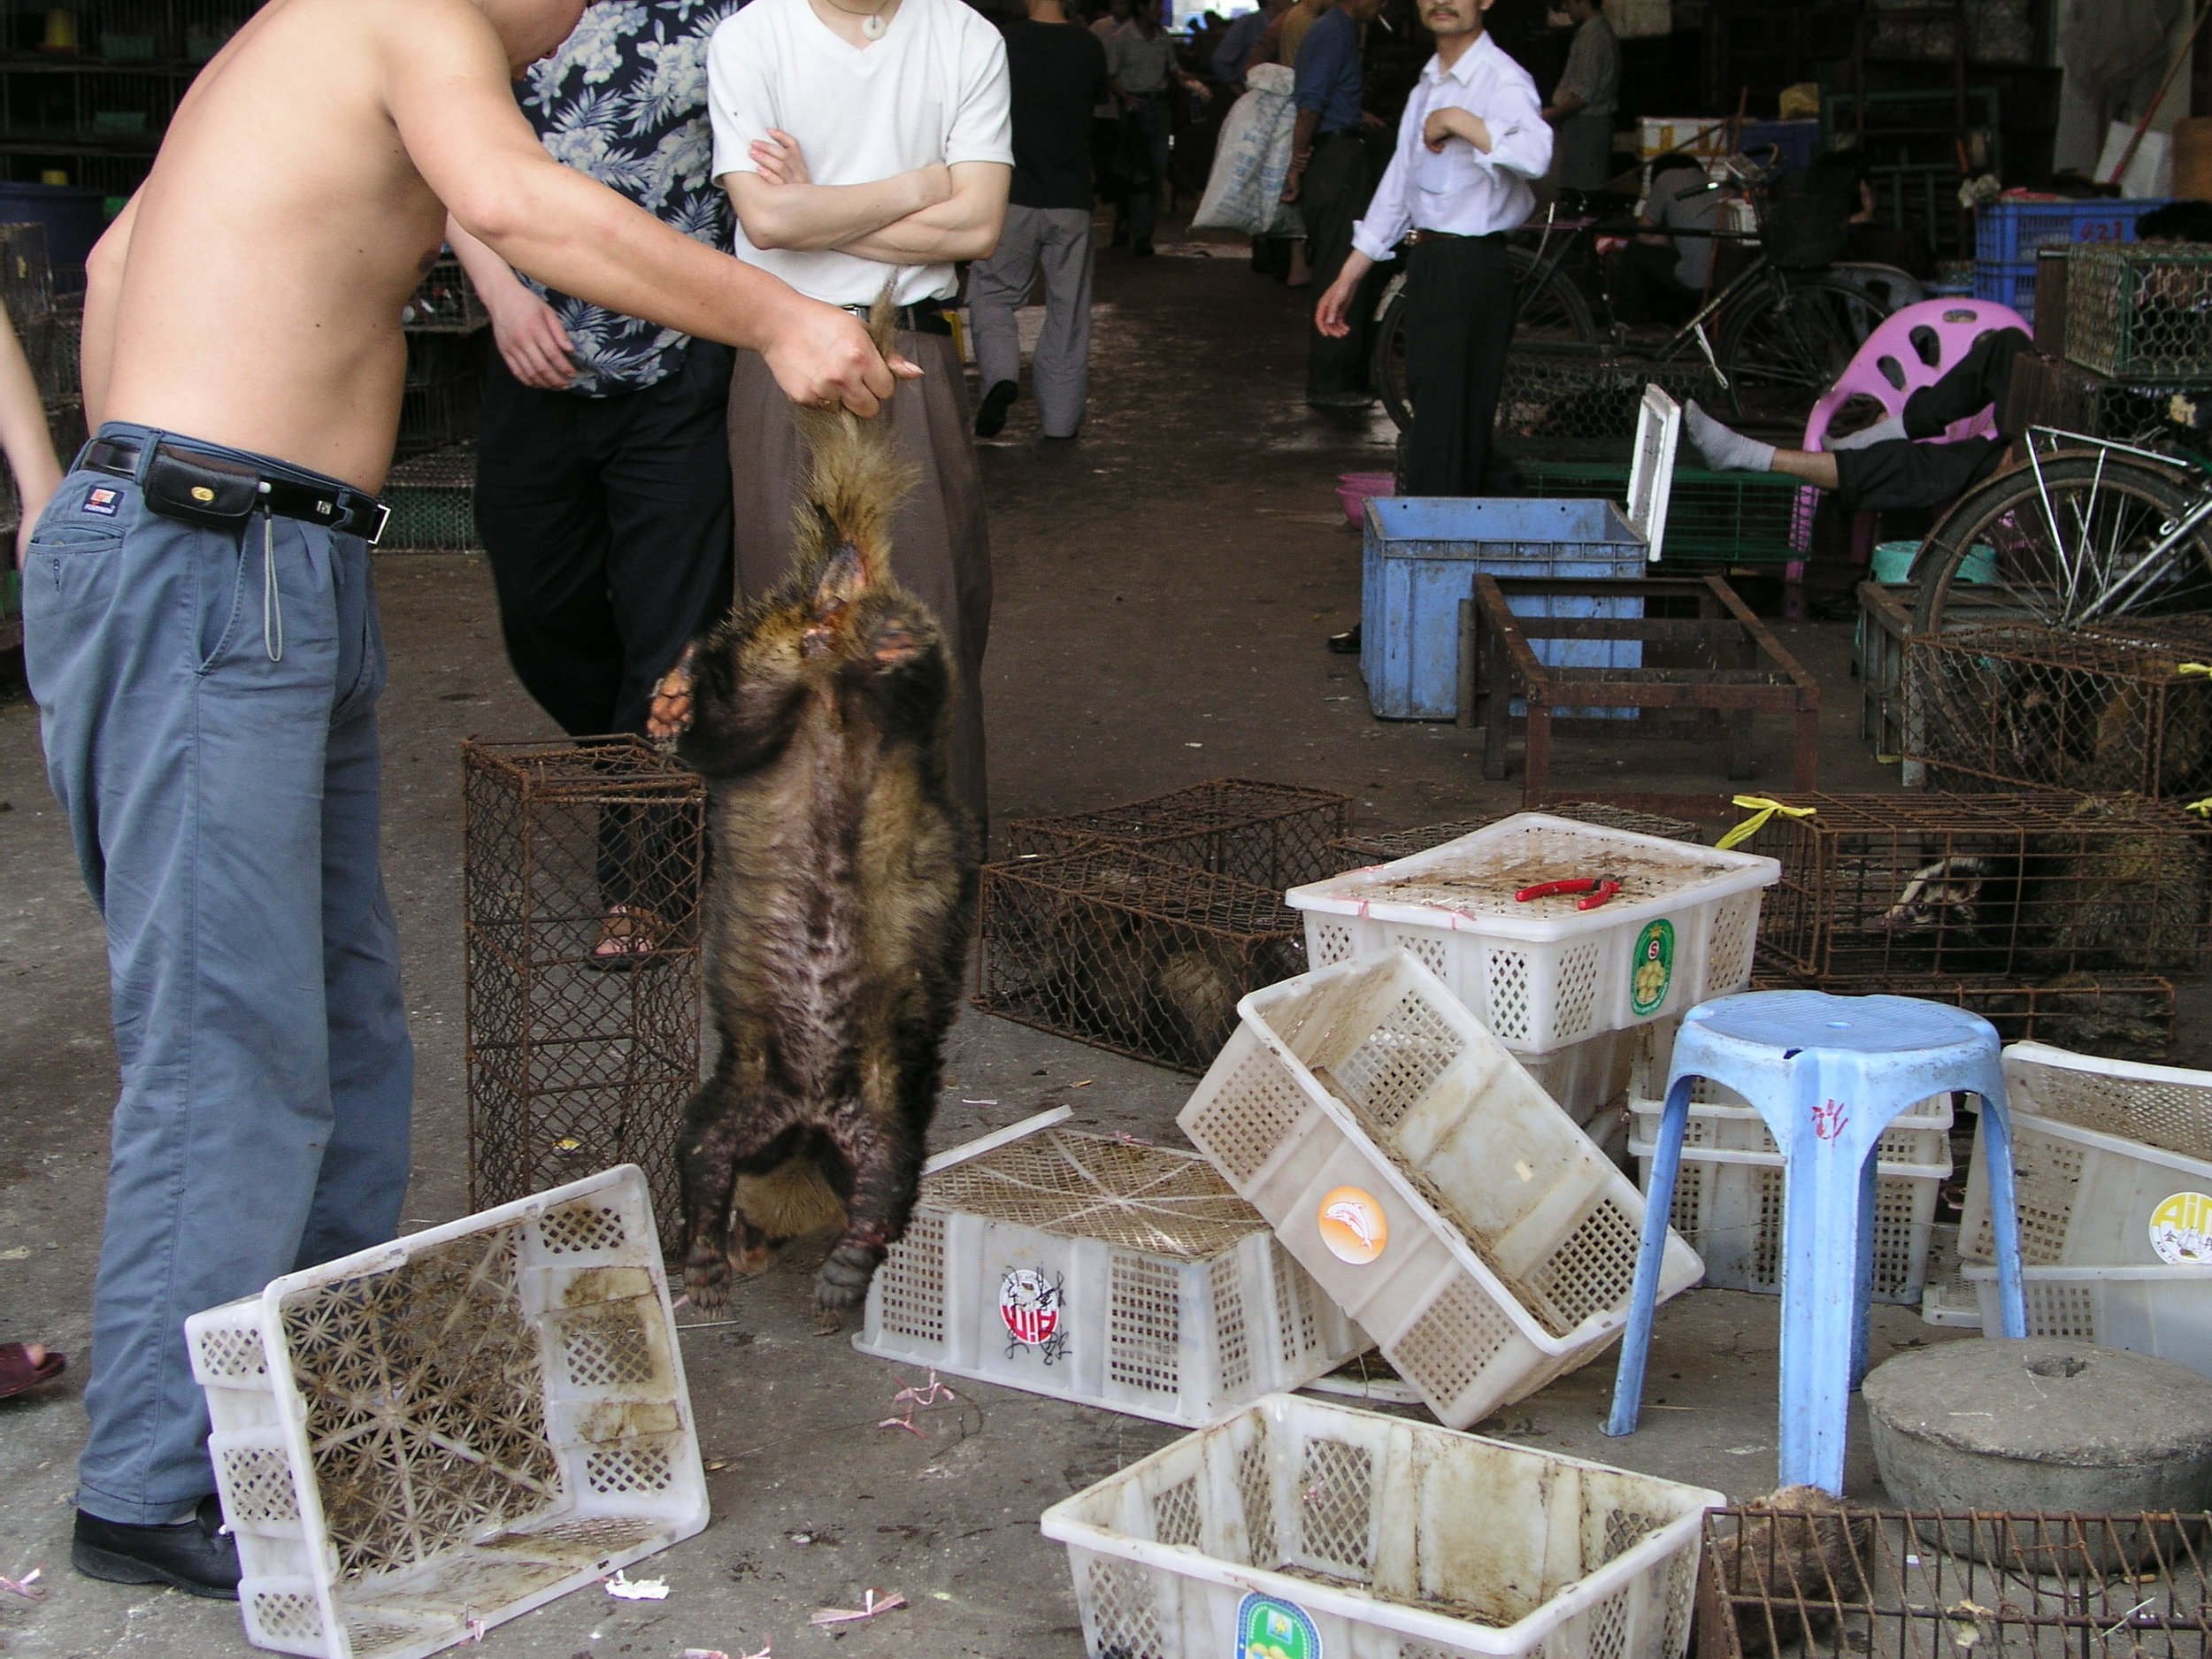 Chau Tau Market in Guangzhou where the SARS epidemic started from live civets .10.JPG